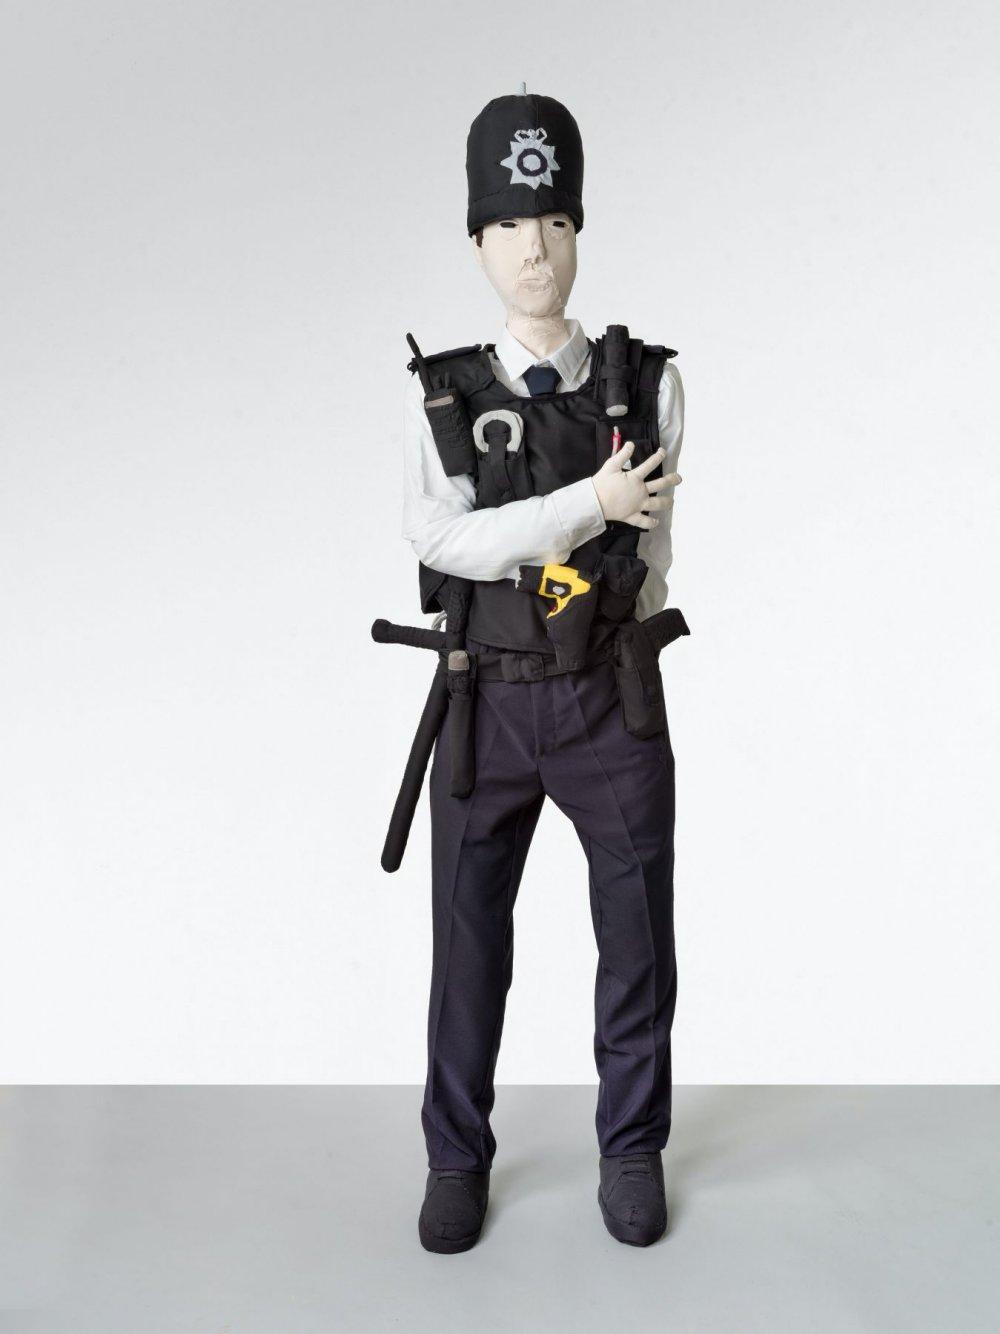 Polizistin (Policewoman)